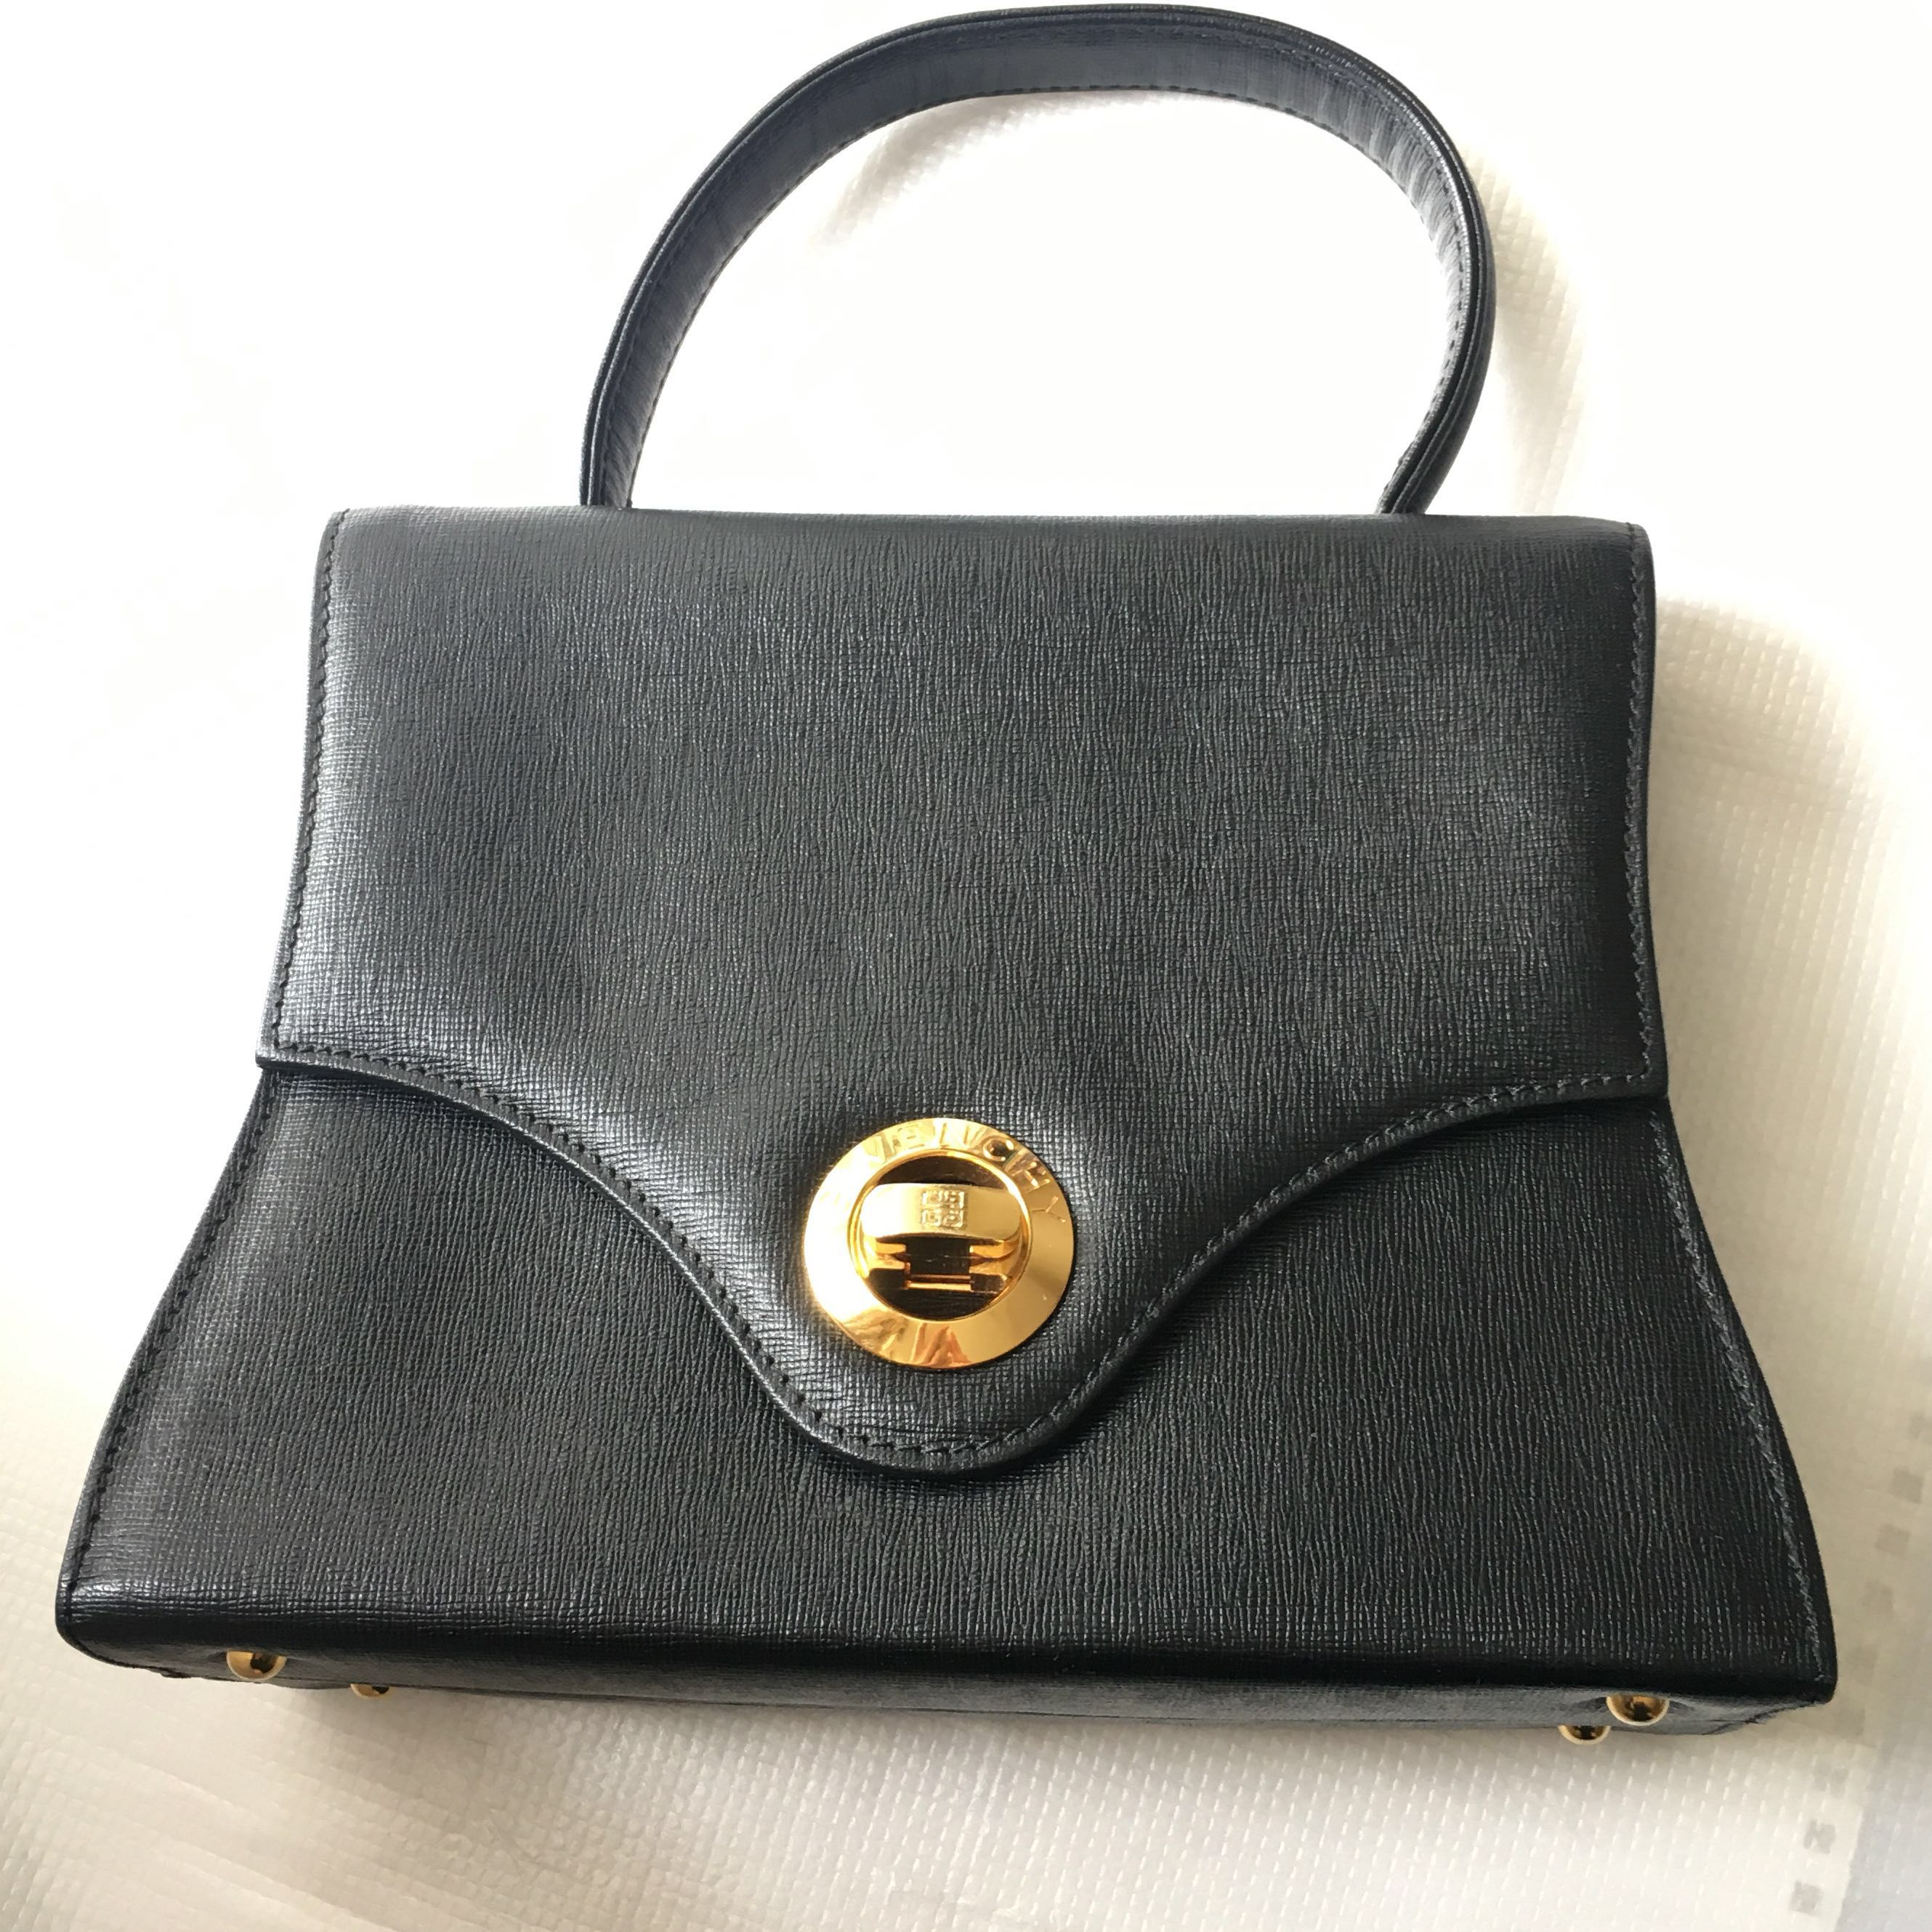 dc220b33207 Givenchy vintage handbag 黑色十字紋牛皮手挽細袋Celine Ferragamo style, Luxury, Bags &  Wallets on Carousell